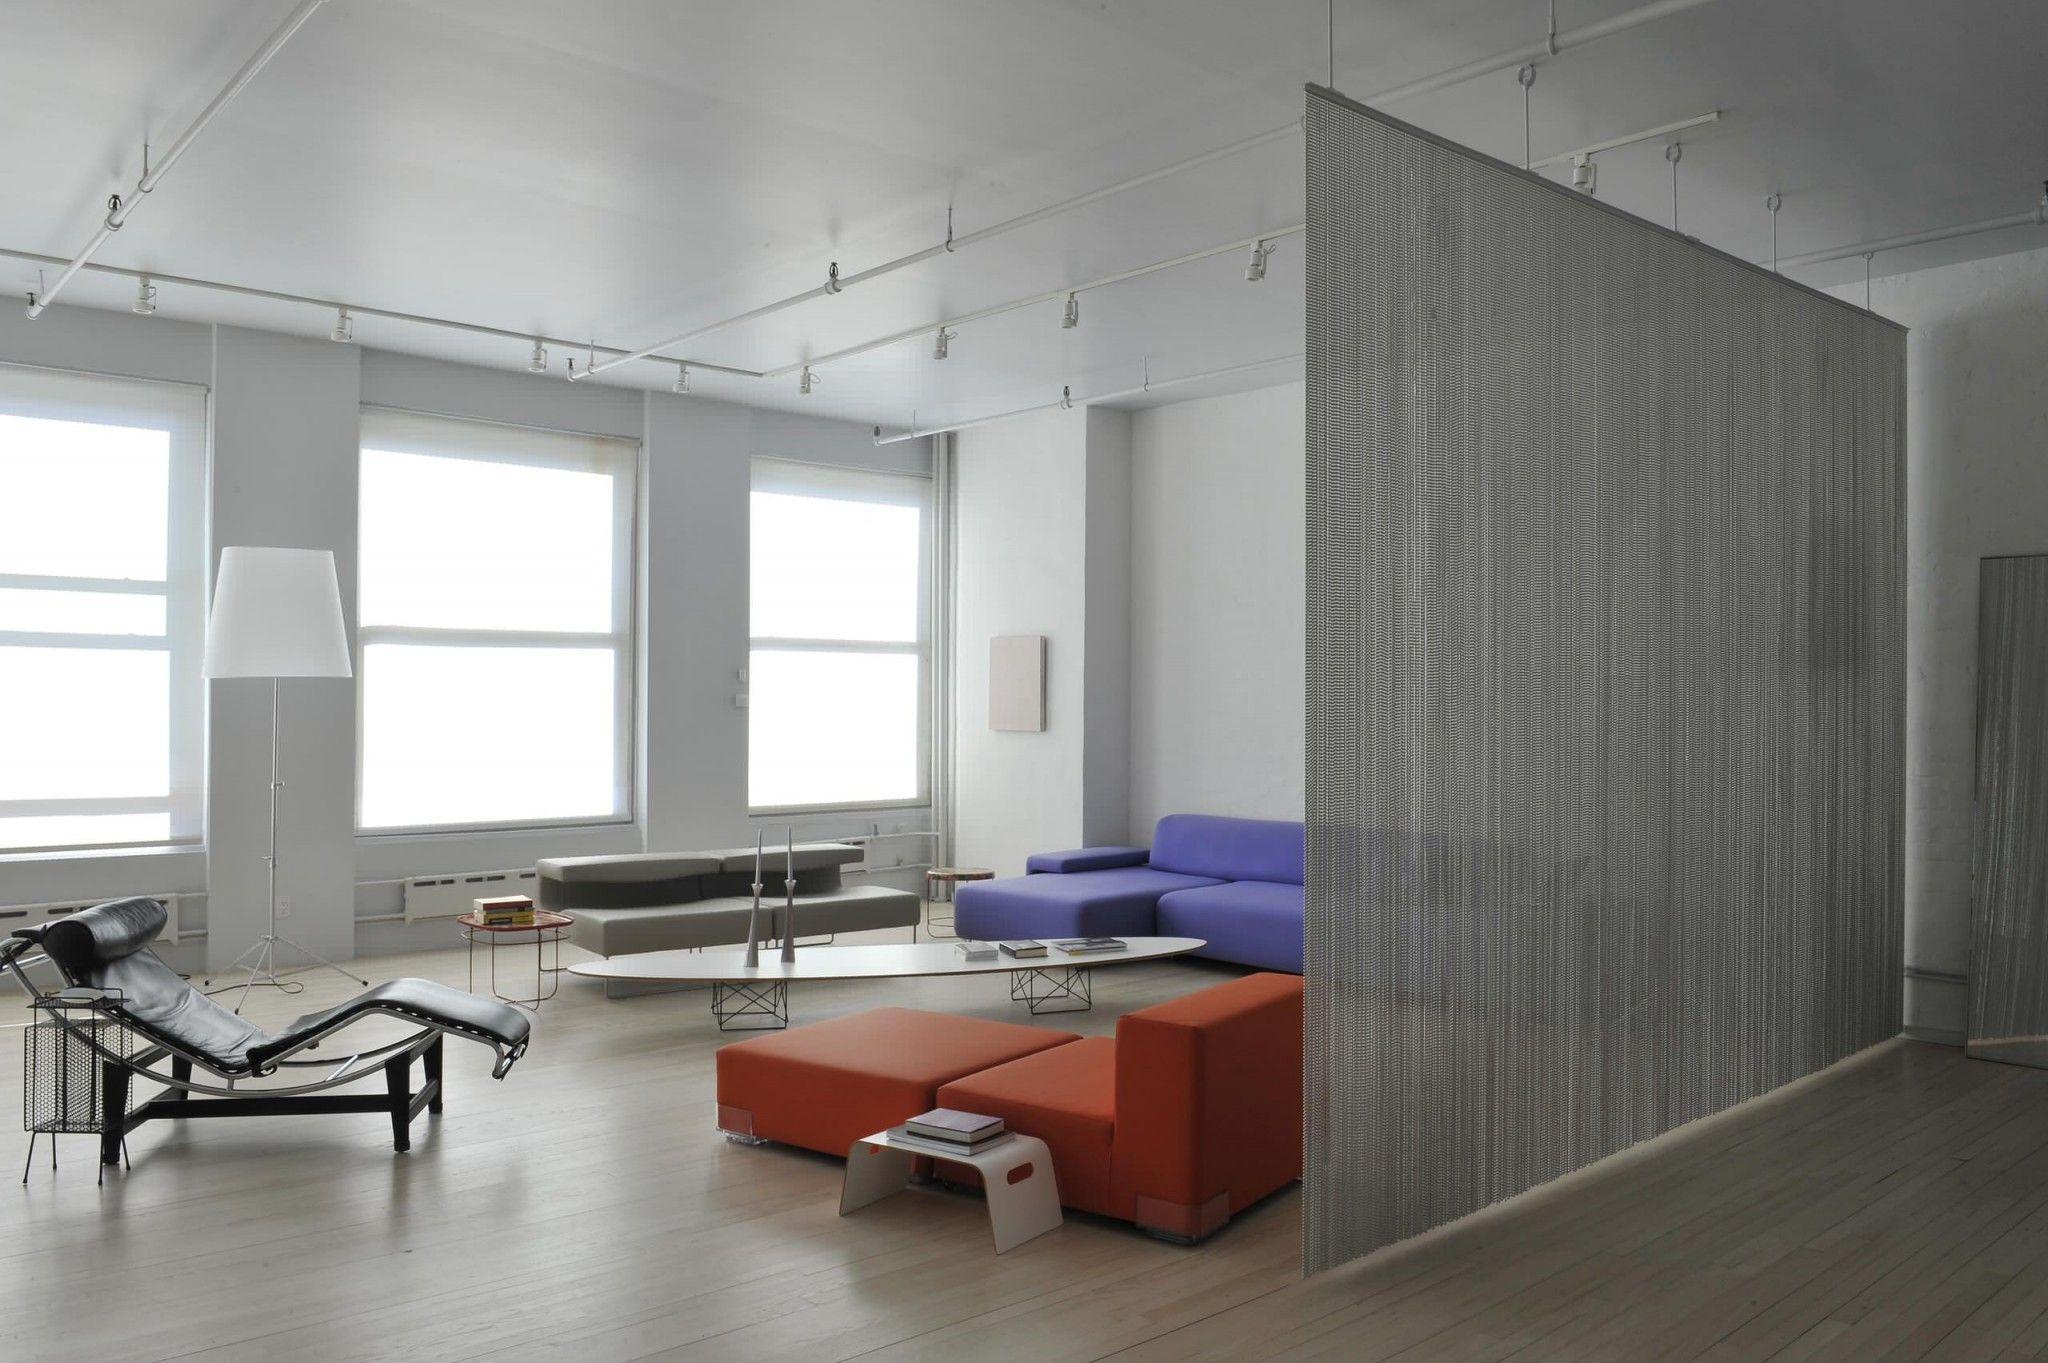 Obscure Interior Design Terms